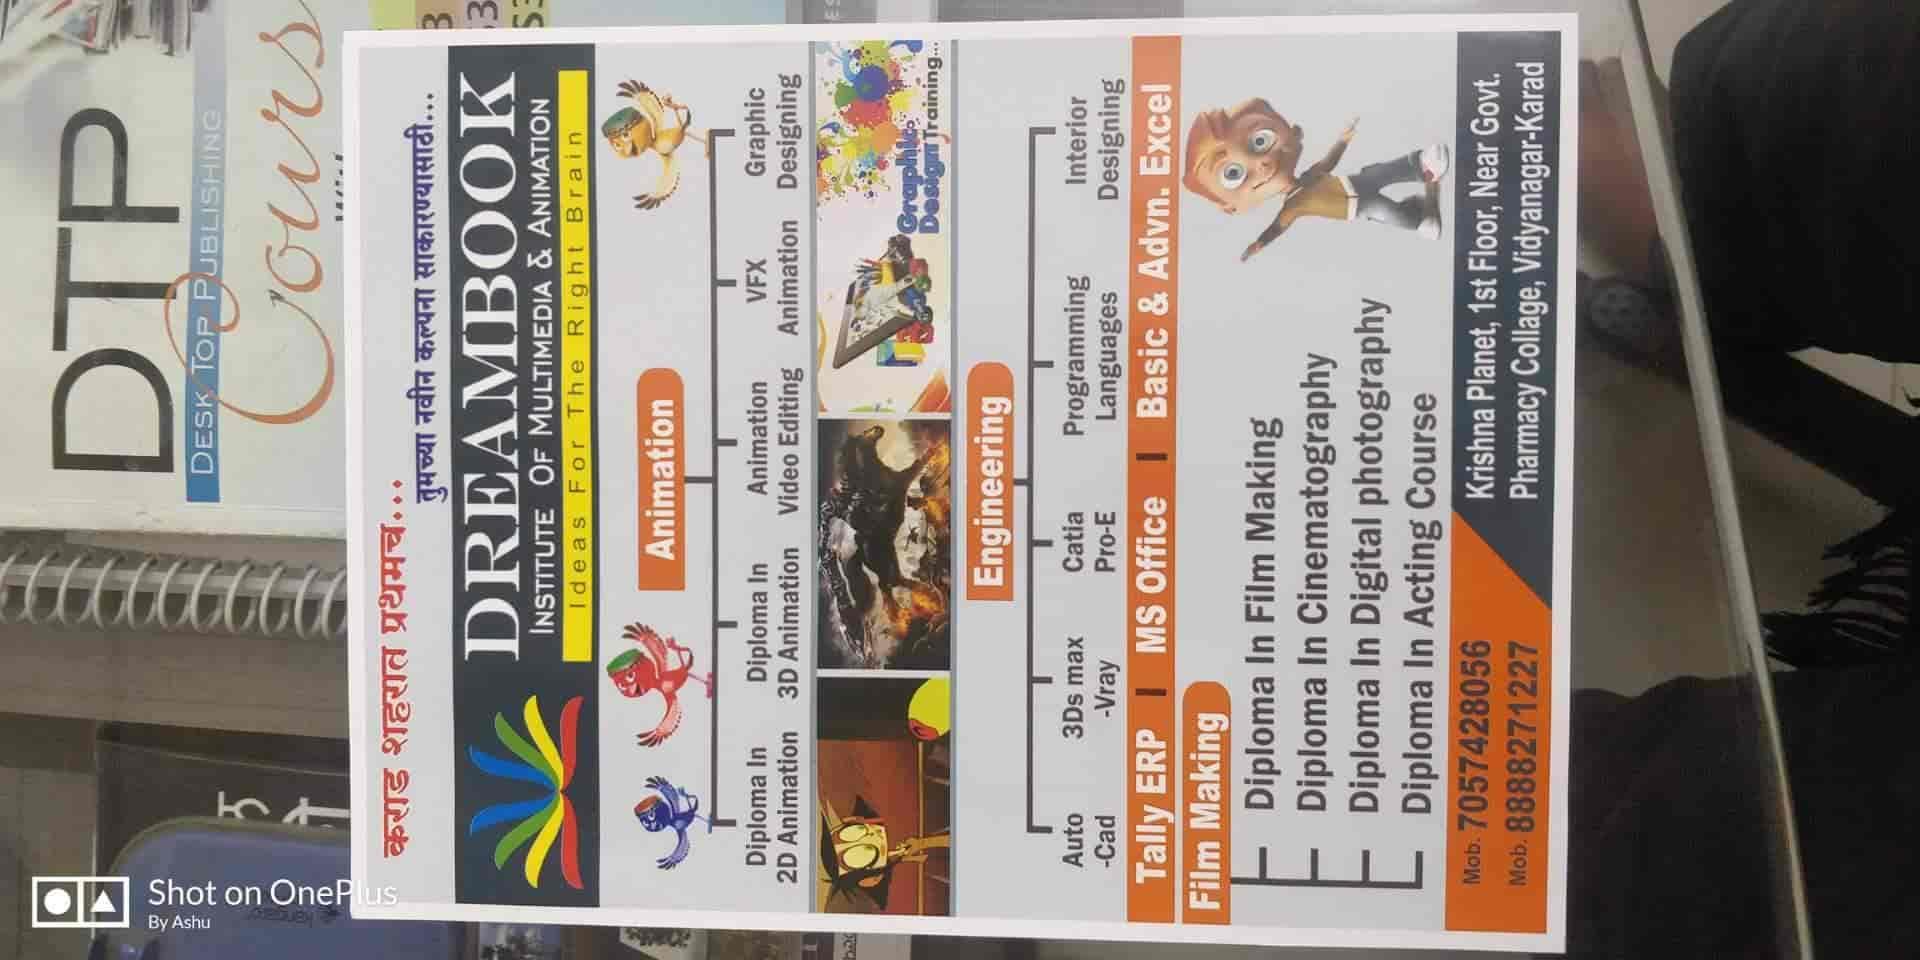 Dreambook Institute Of Animation And Filmmaking, Vidyanagar